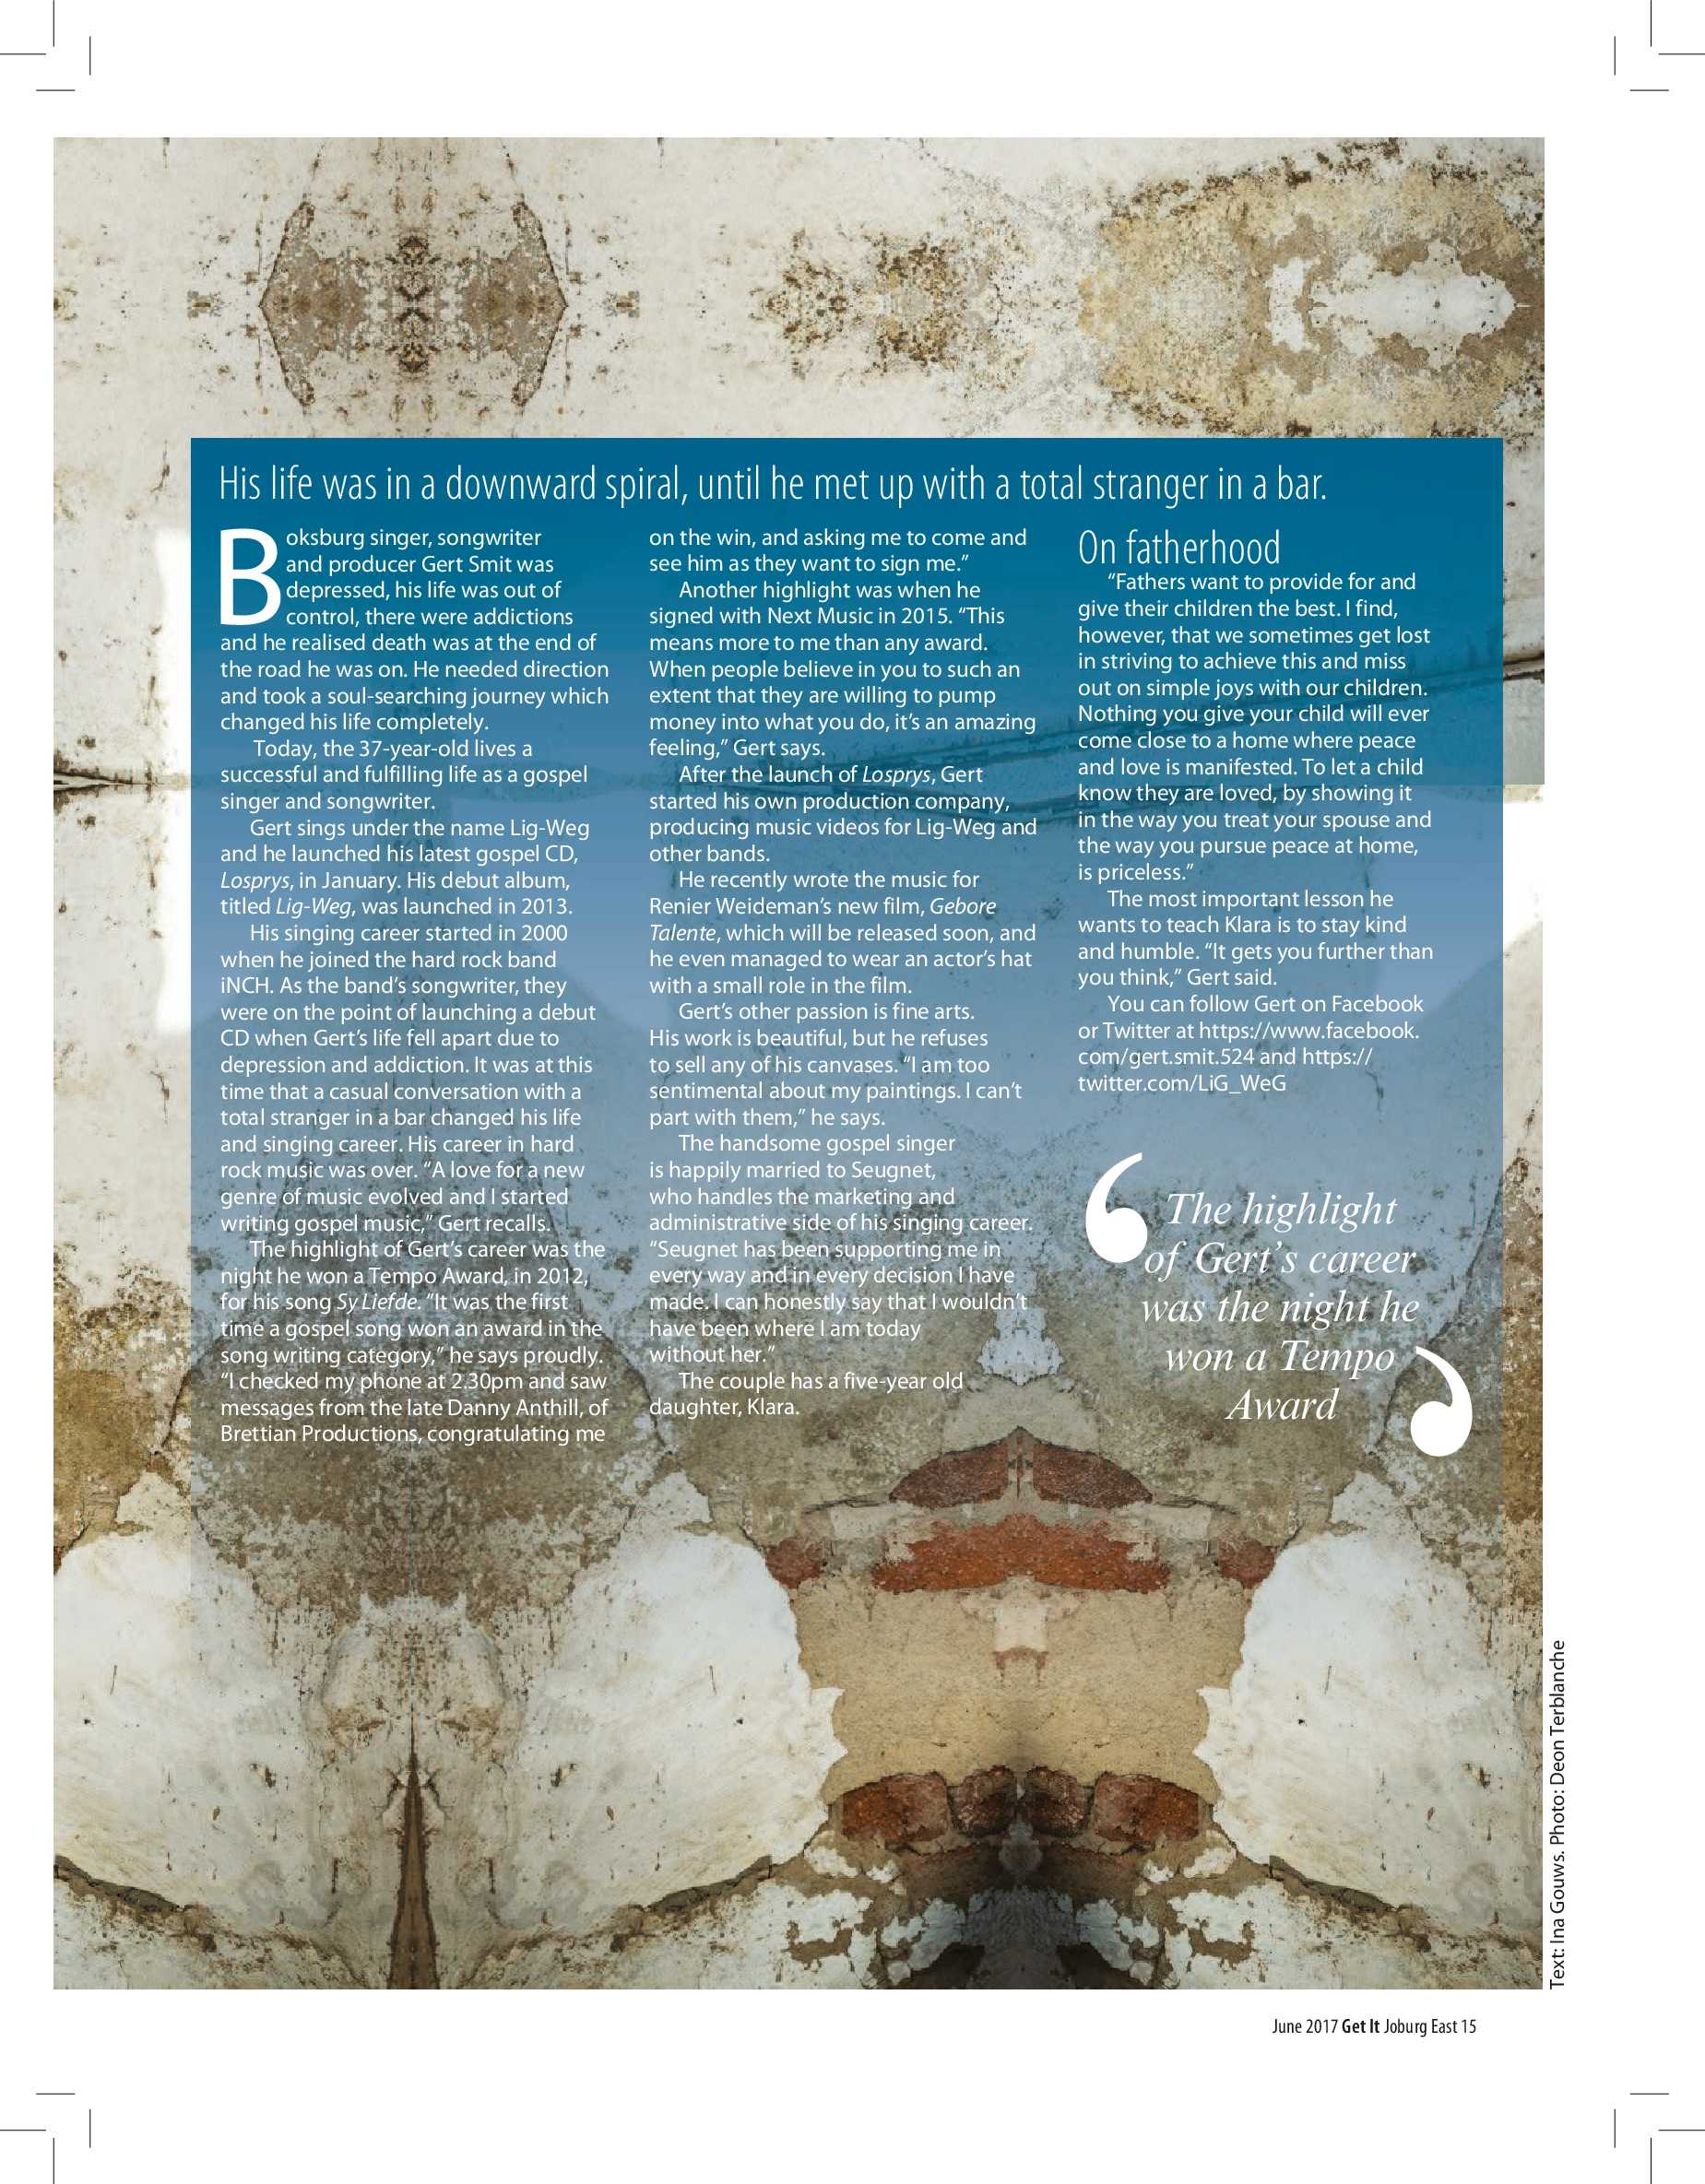 get-east-june-2017-epapers-page-15